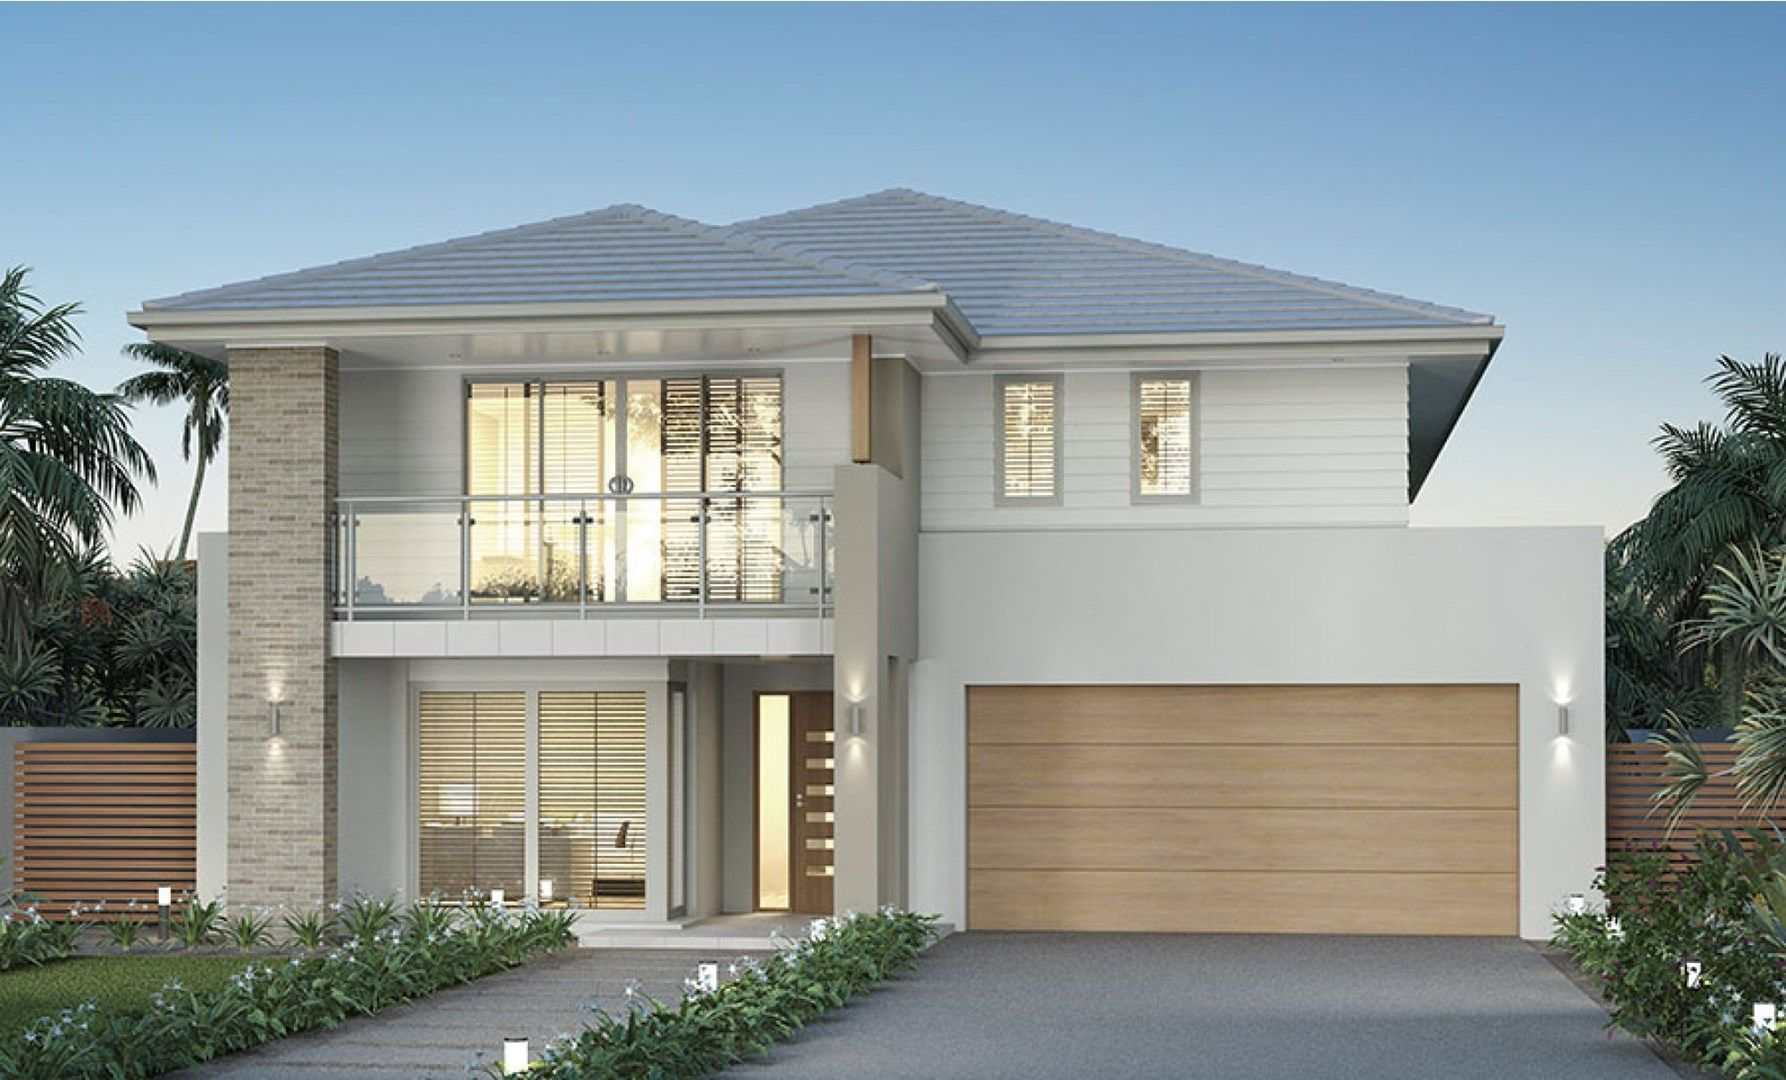 Lot 316 New Road, Springfield QLD 4300, Image 0